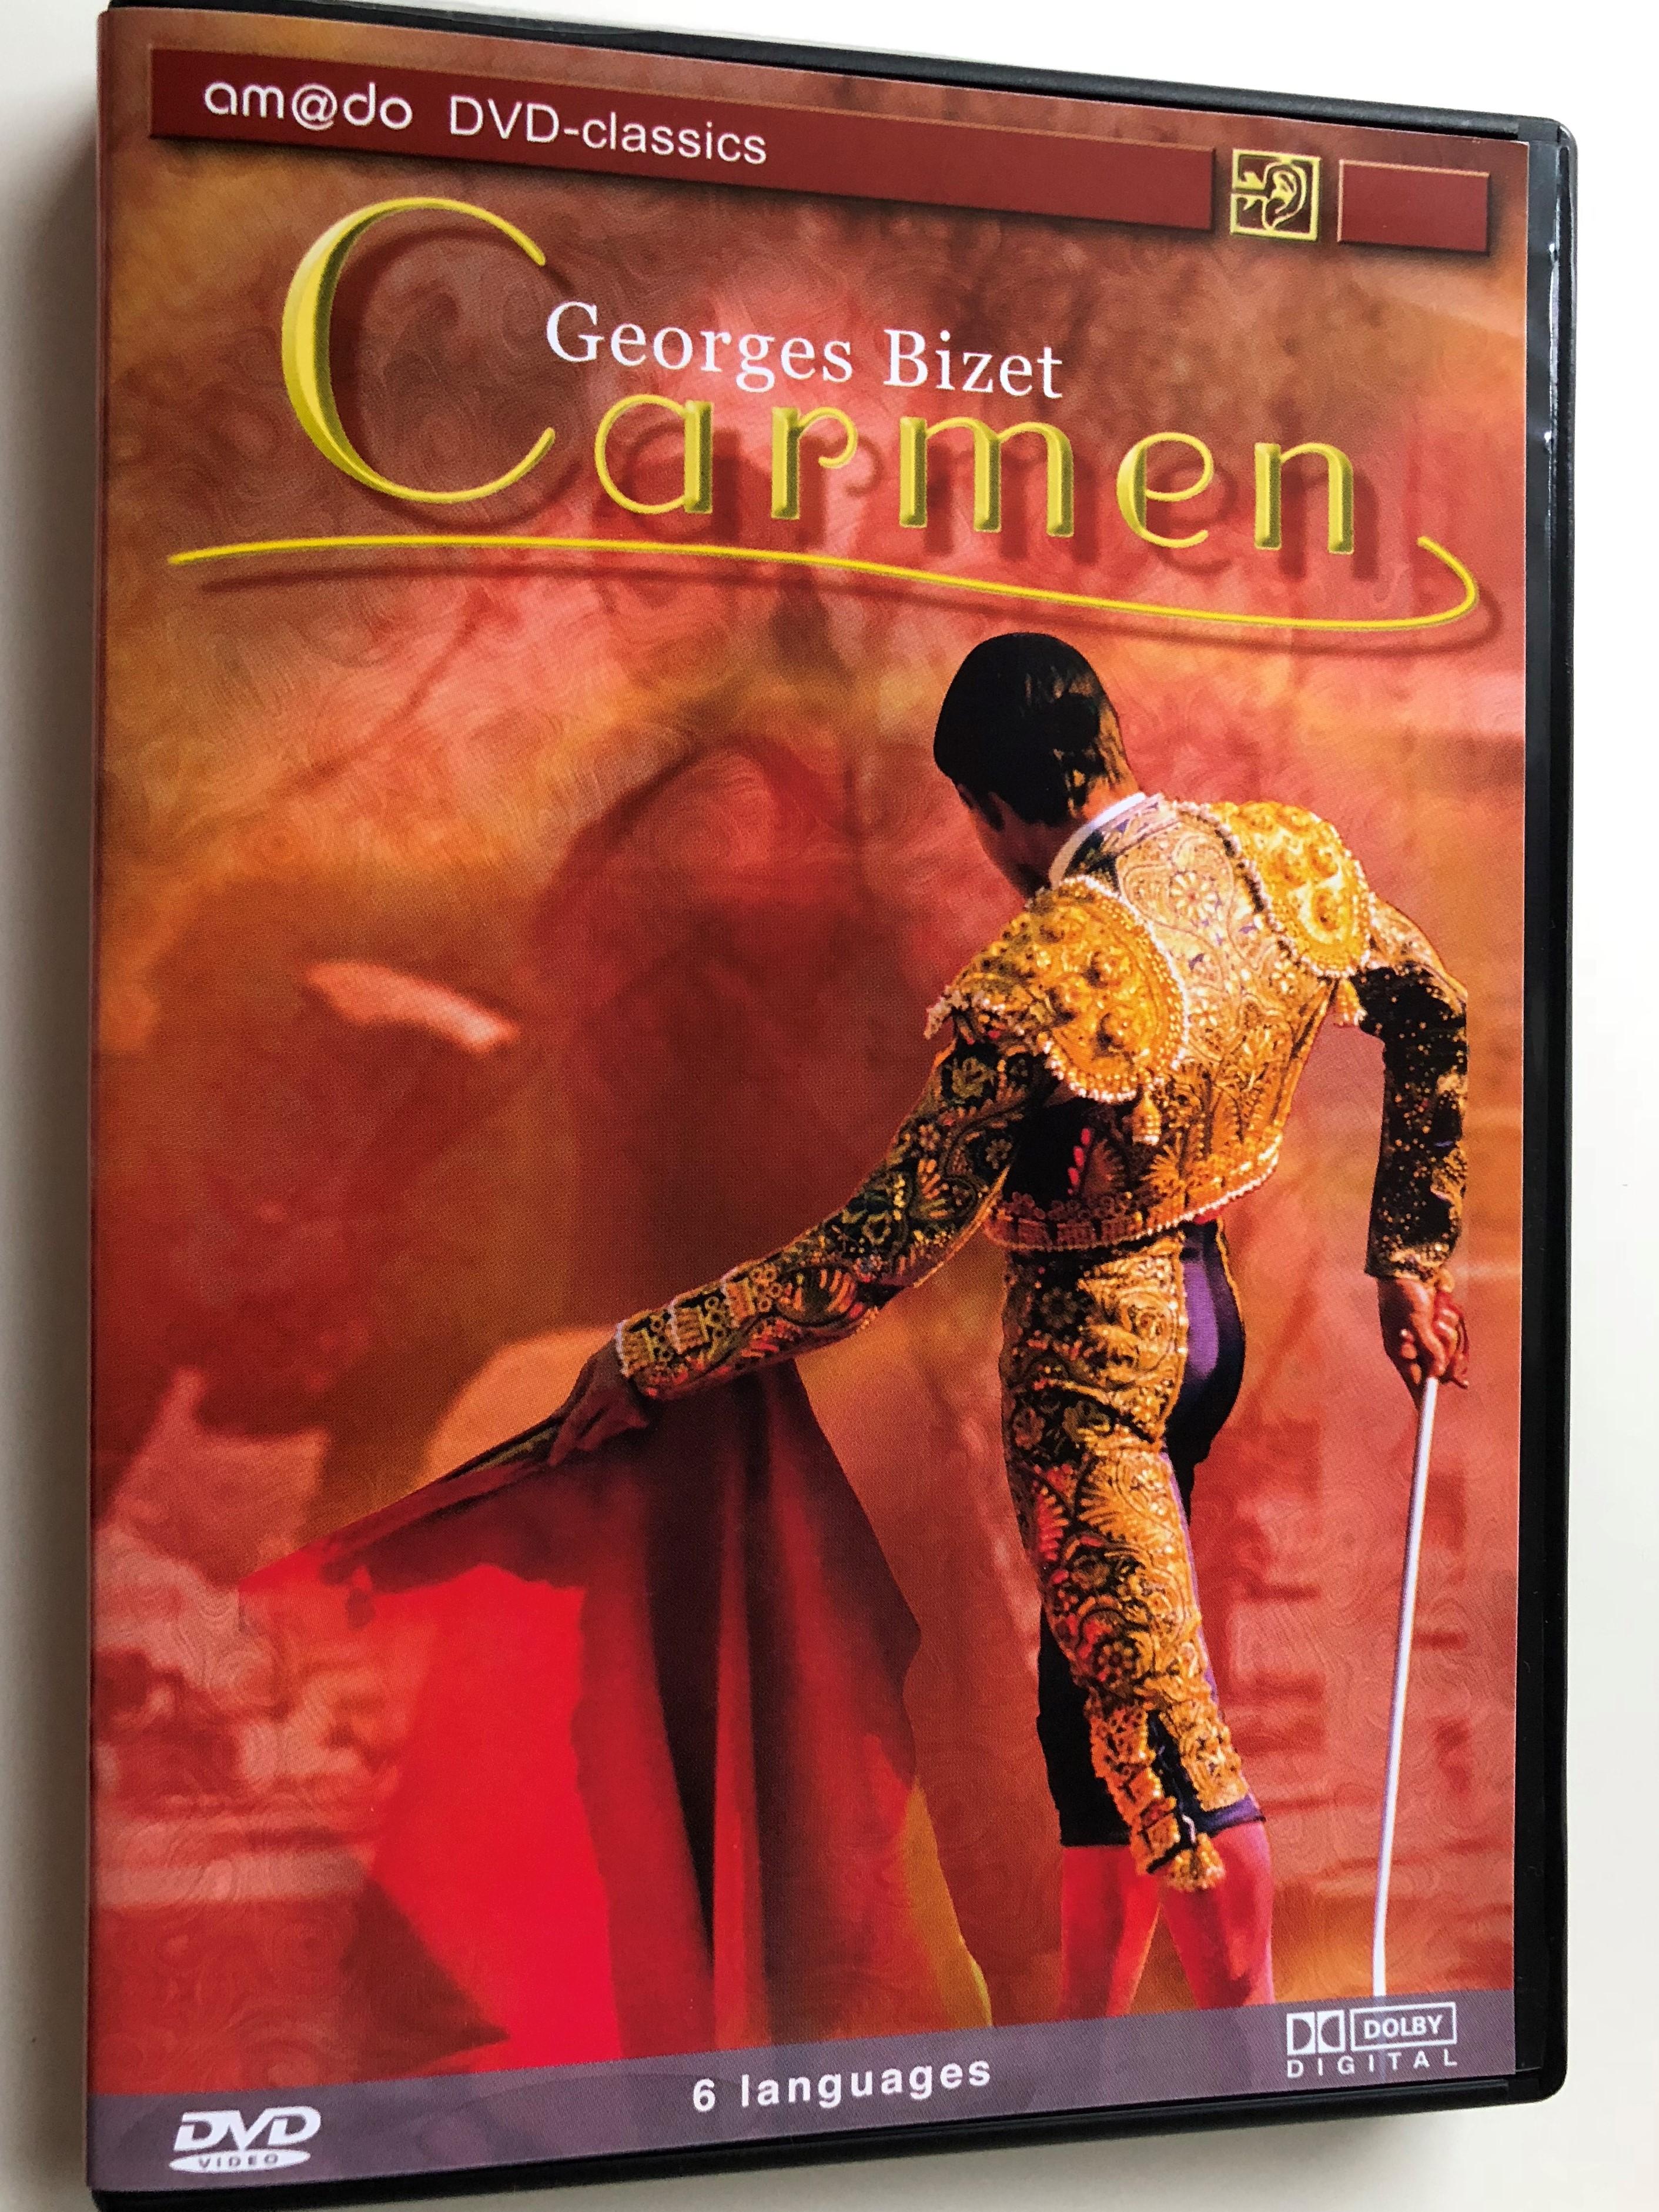 georges-bizet-carmen-dvd-2002-am-do-classics-malgorzata-walewska-mario-malagnini-boaz-senator-ulrike-sonntag-ivan-tomasev-stagione-d-opera-italiana-honv-d-ensemble-budapest-flamenco-tanztherater-barcelona-1-.jpg